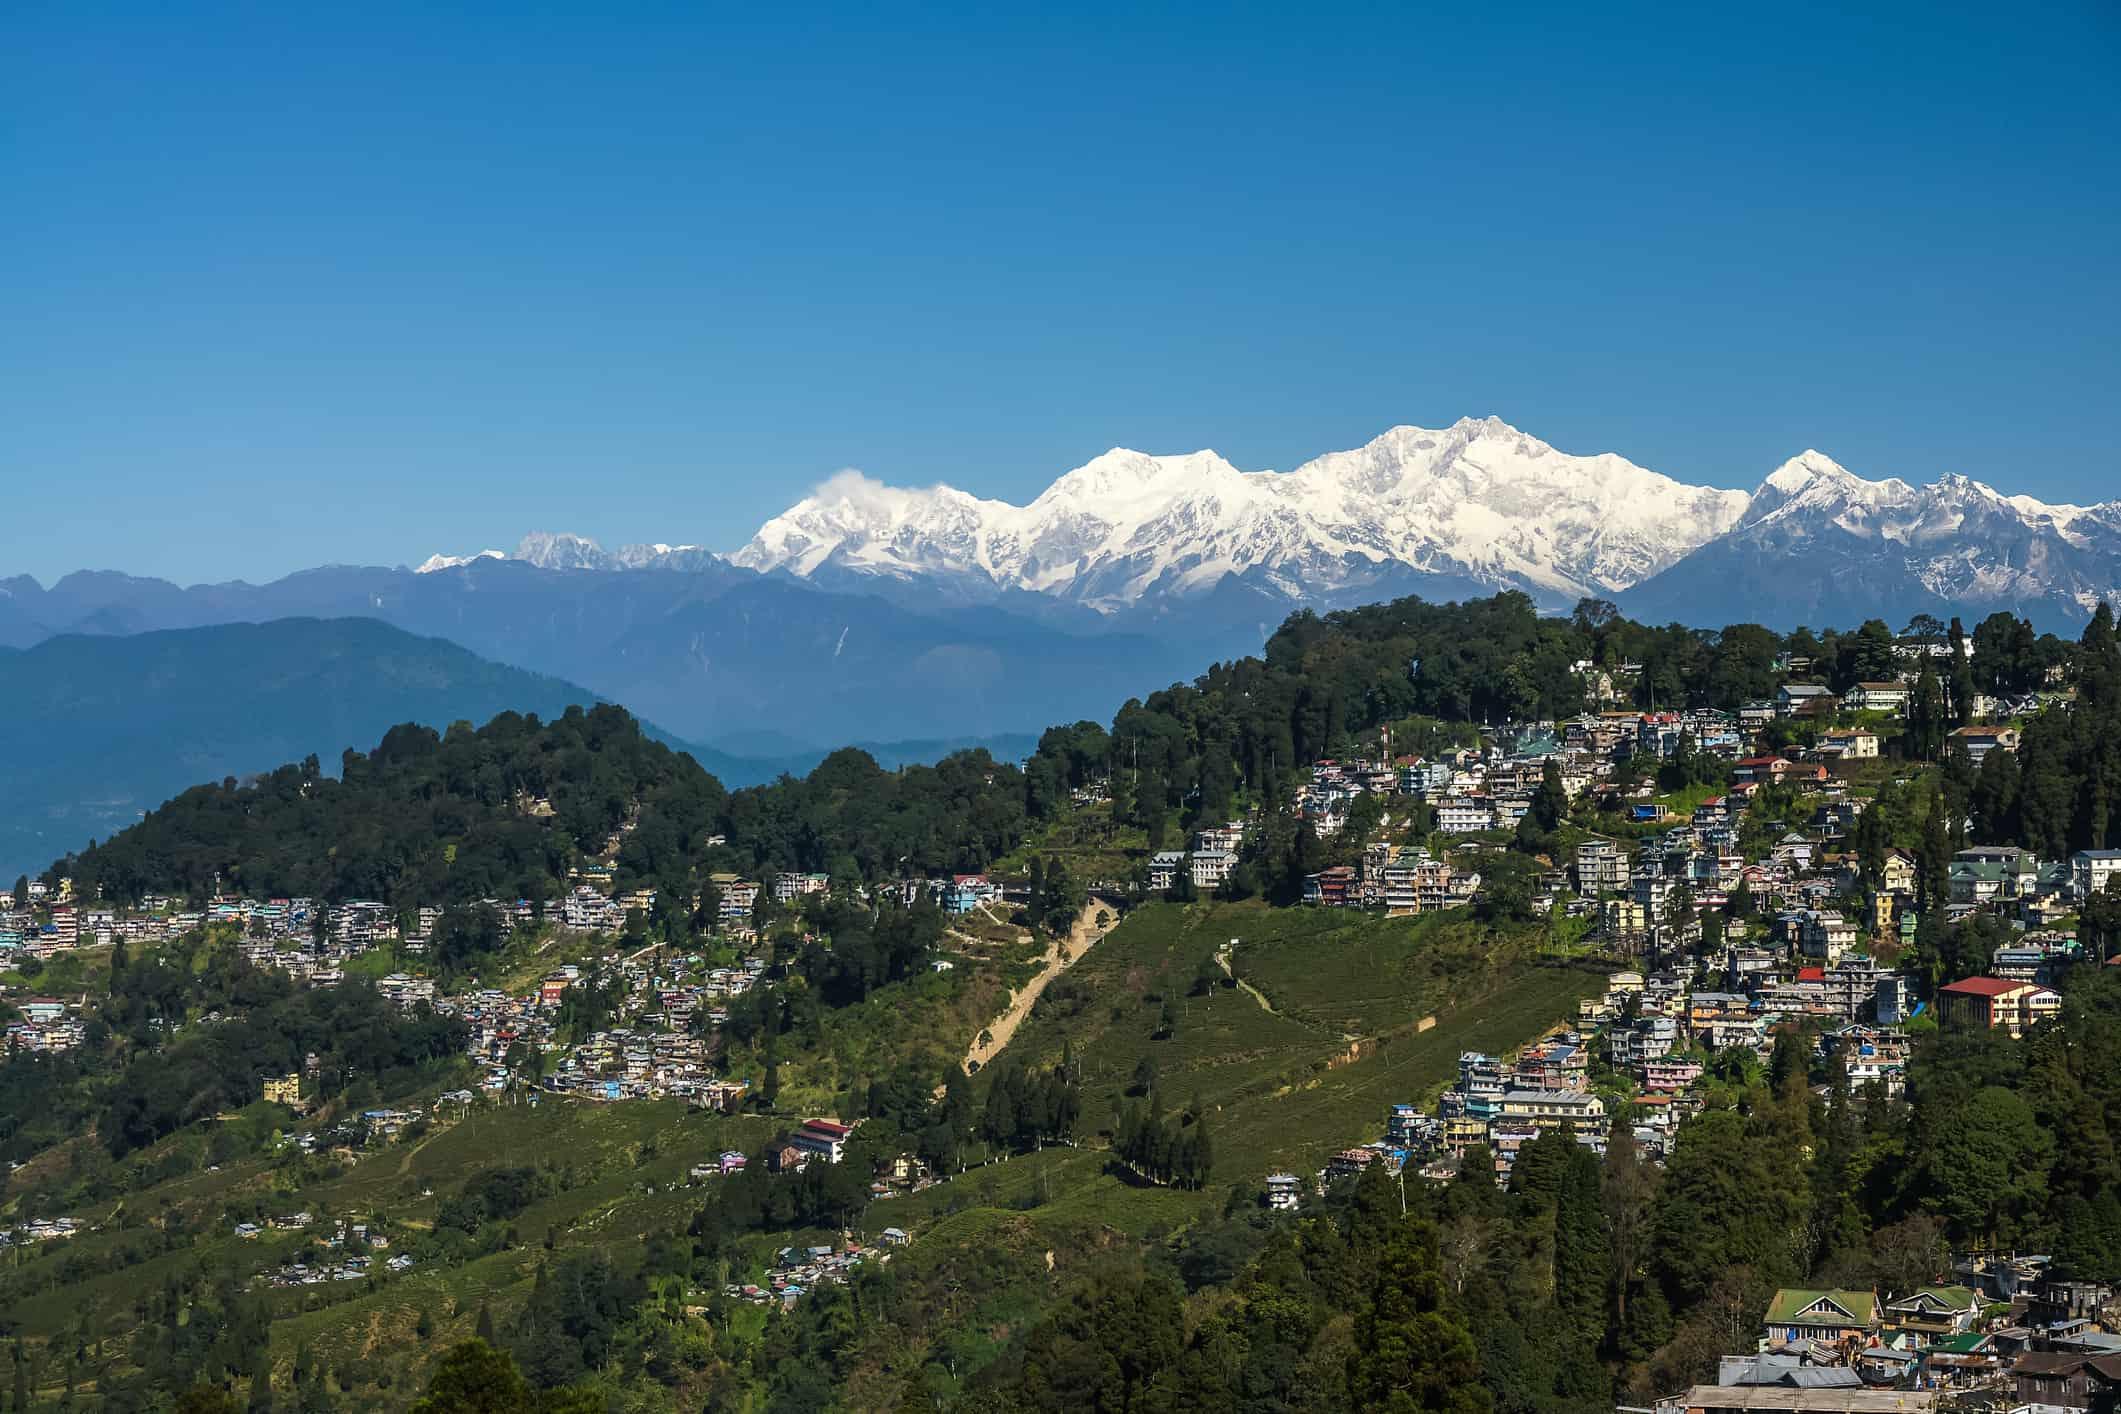 Darjeeling Town and Tea Plantation with Himalaya Mountains